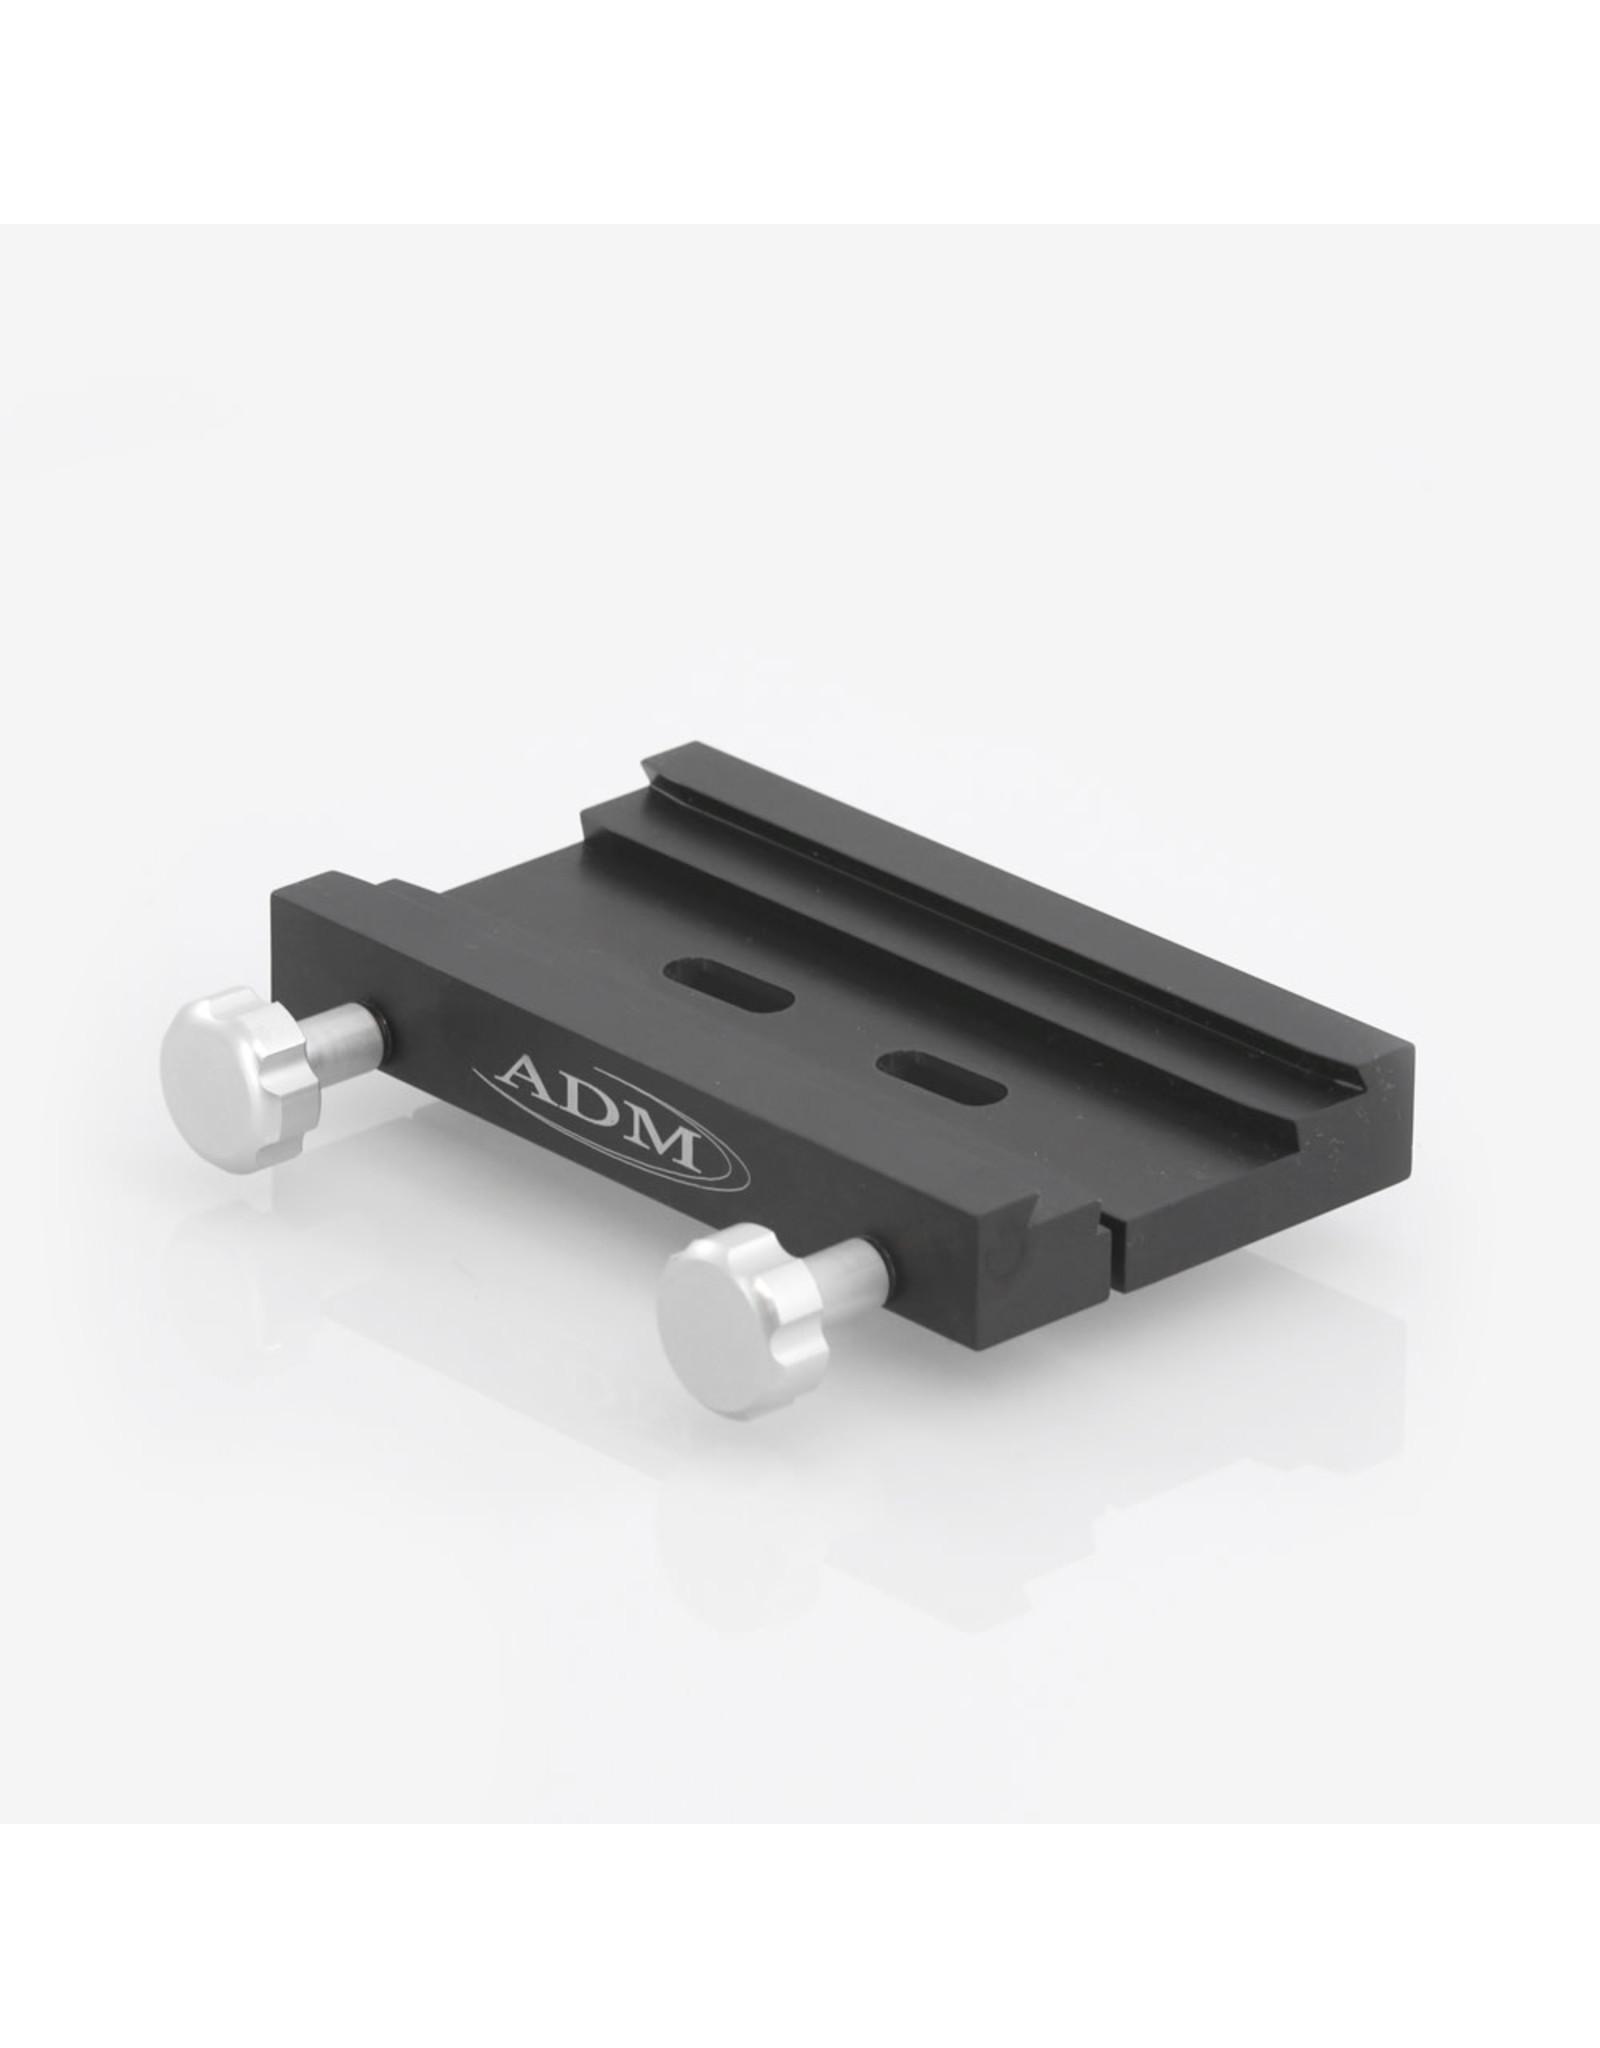 ADM ADM-DUAL-SLT8- DUAL Series Saddle. Slotted Hole Version for 8mm Socket Head